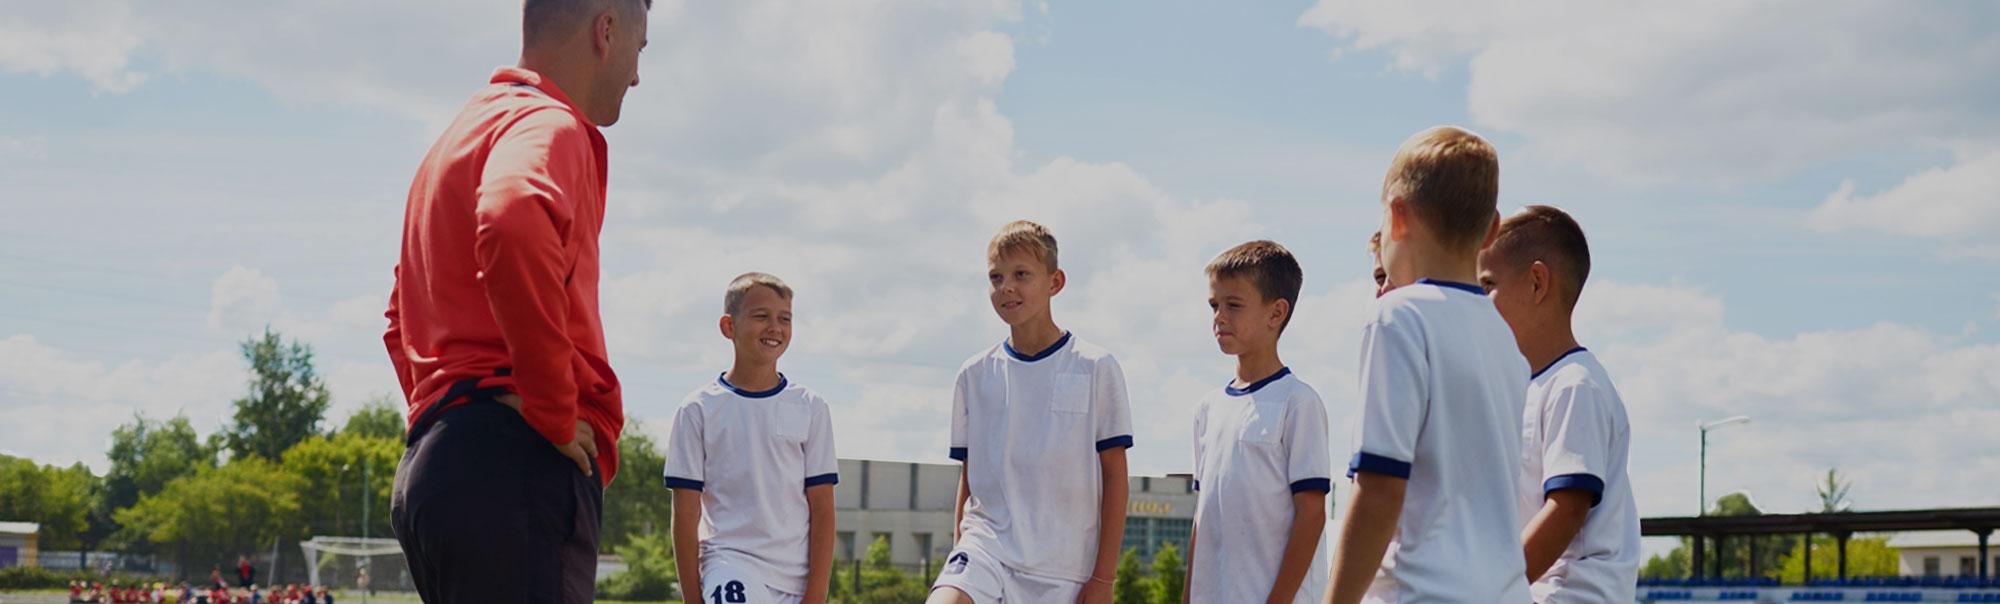 Sport Ebli GmbH